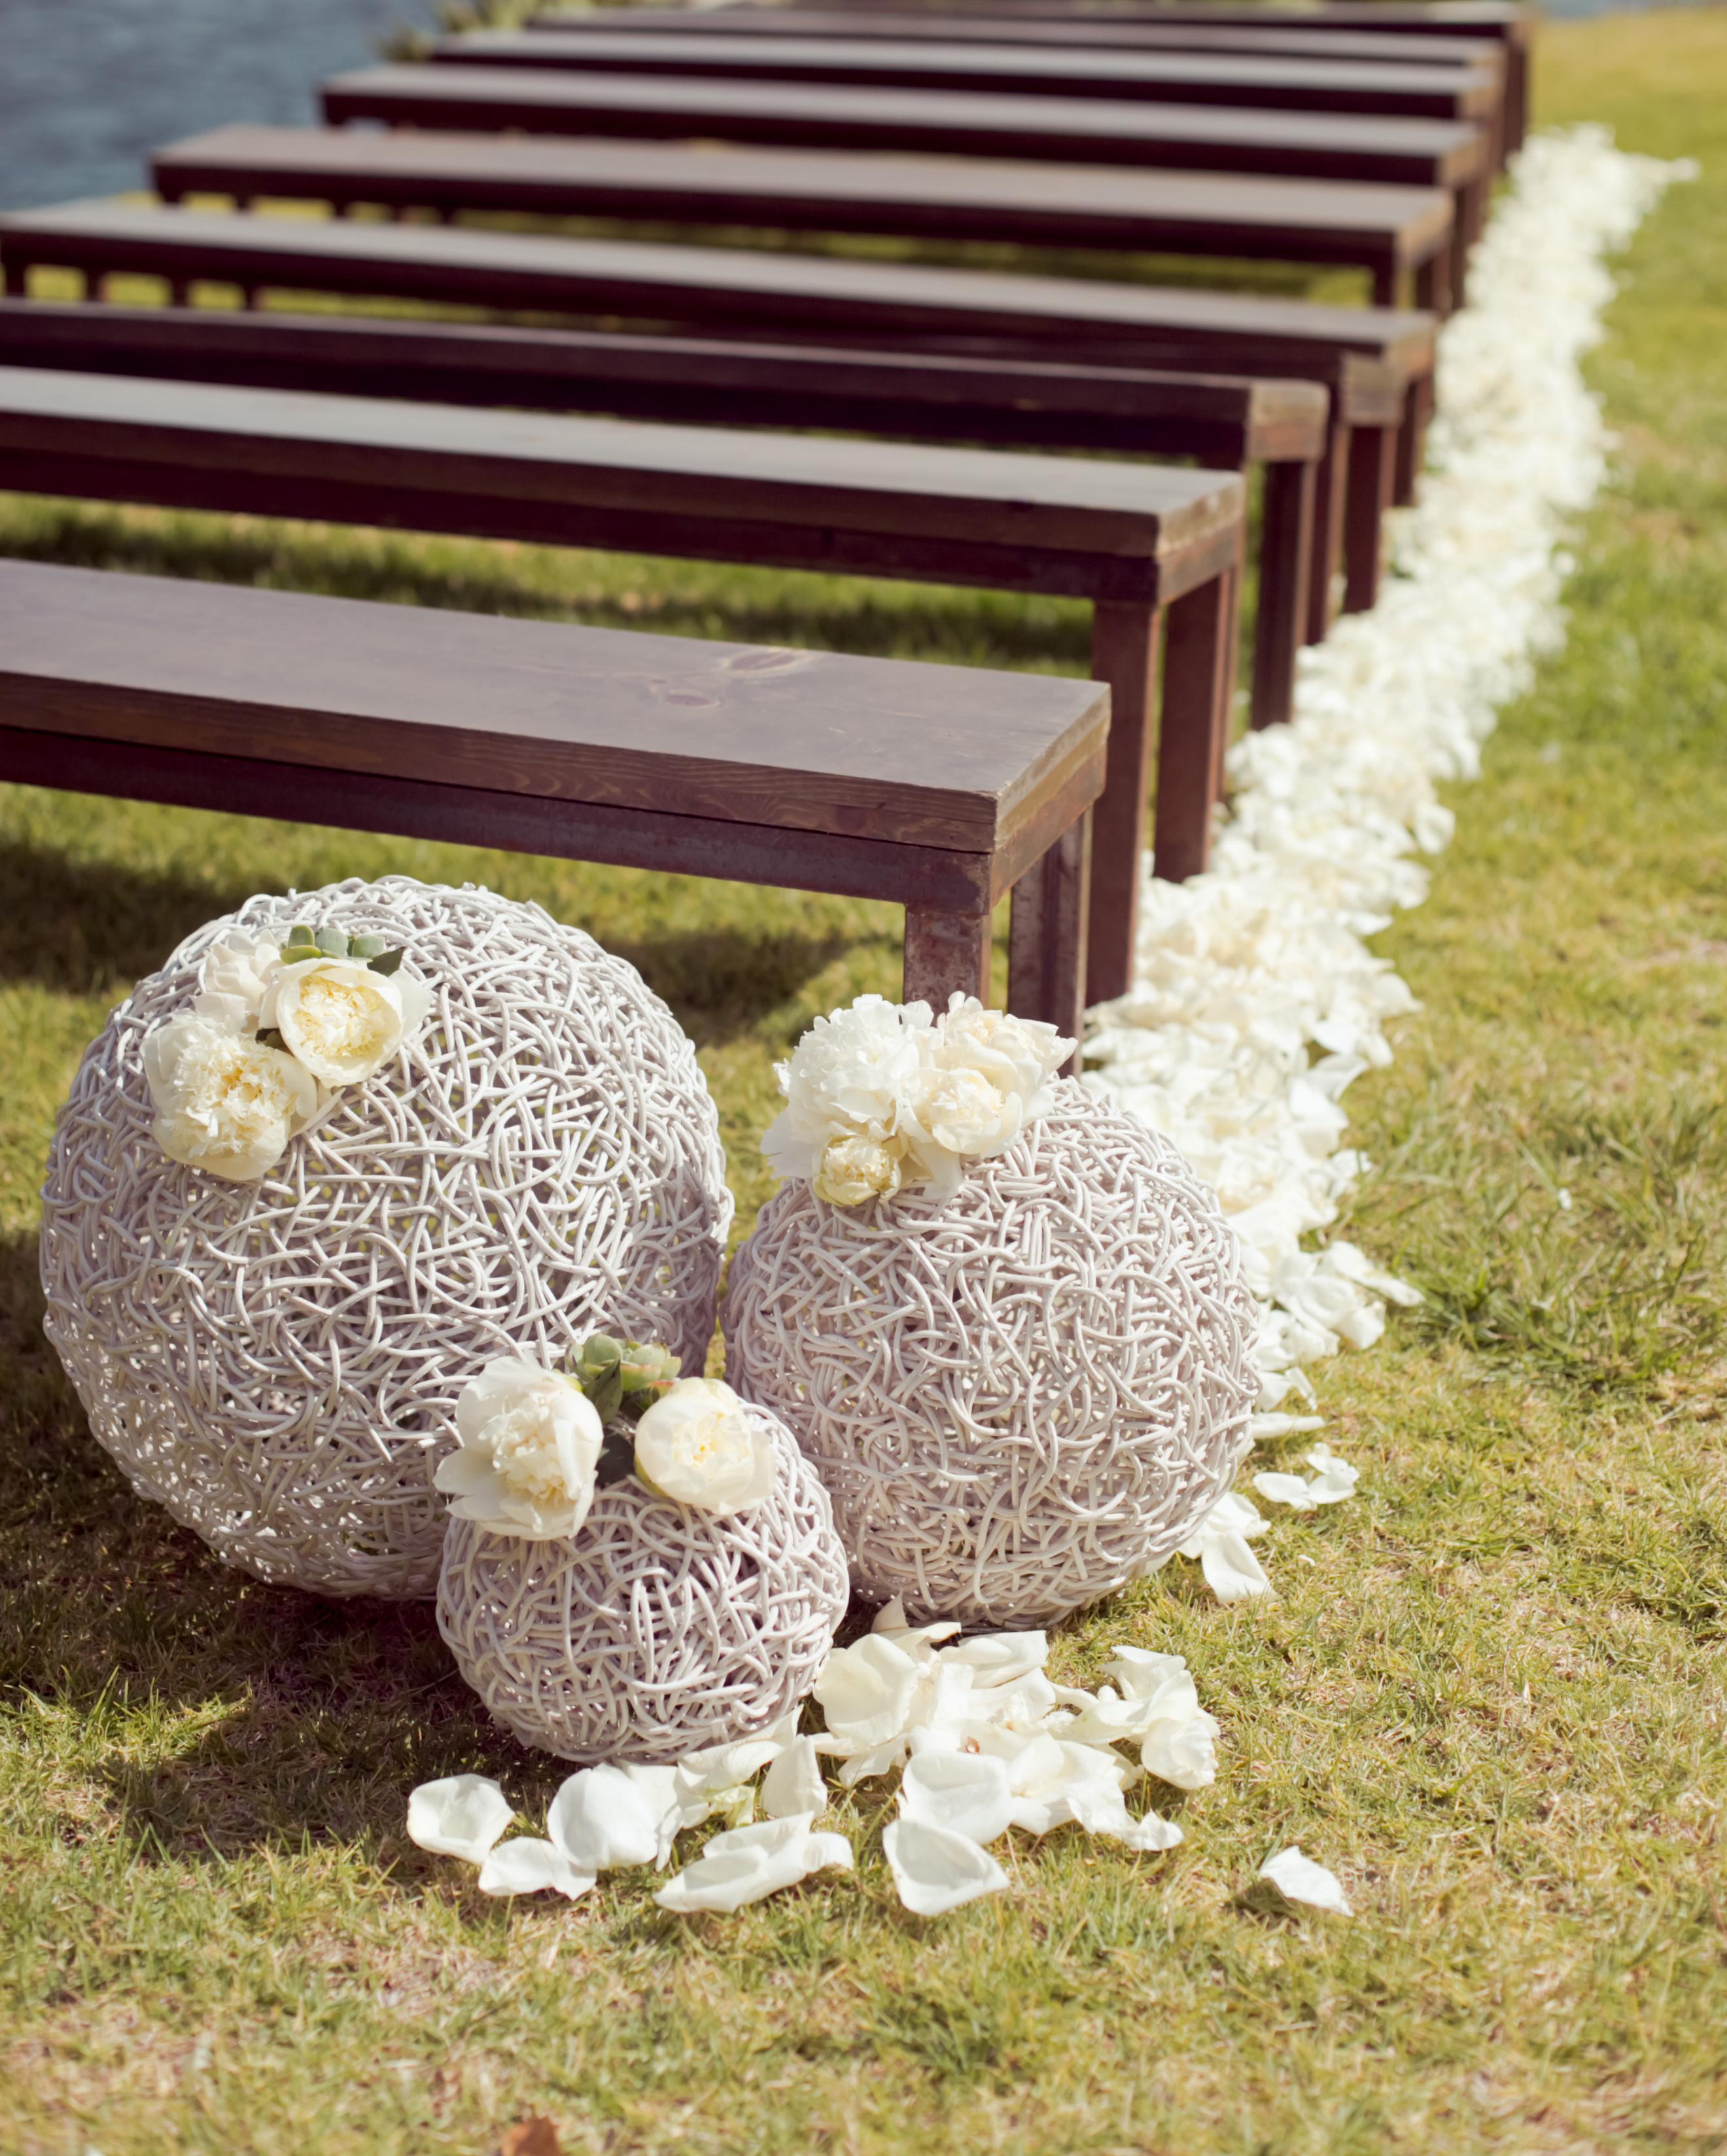 emma-michelle-wedding-aisle-0321-s112079-0715.jpg